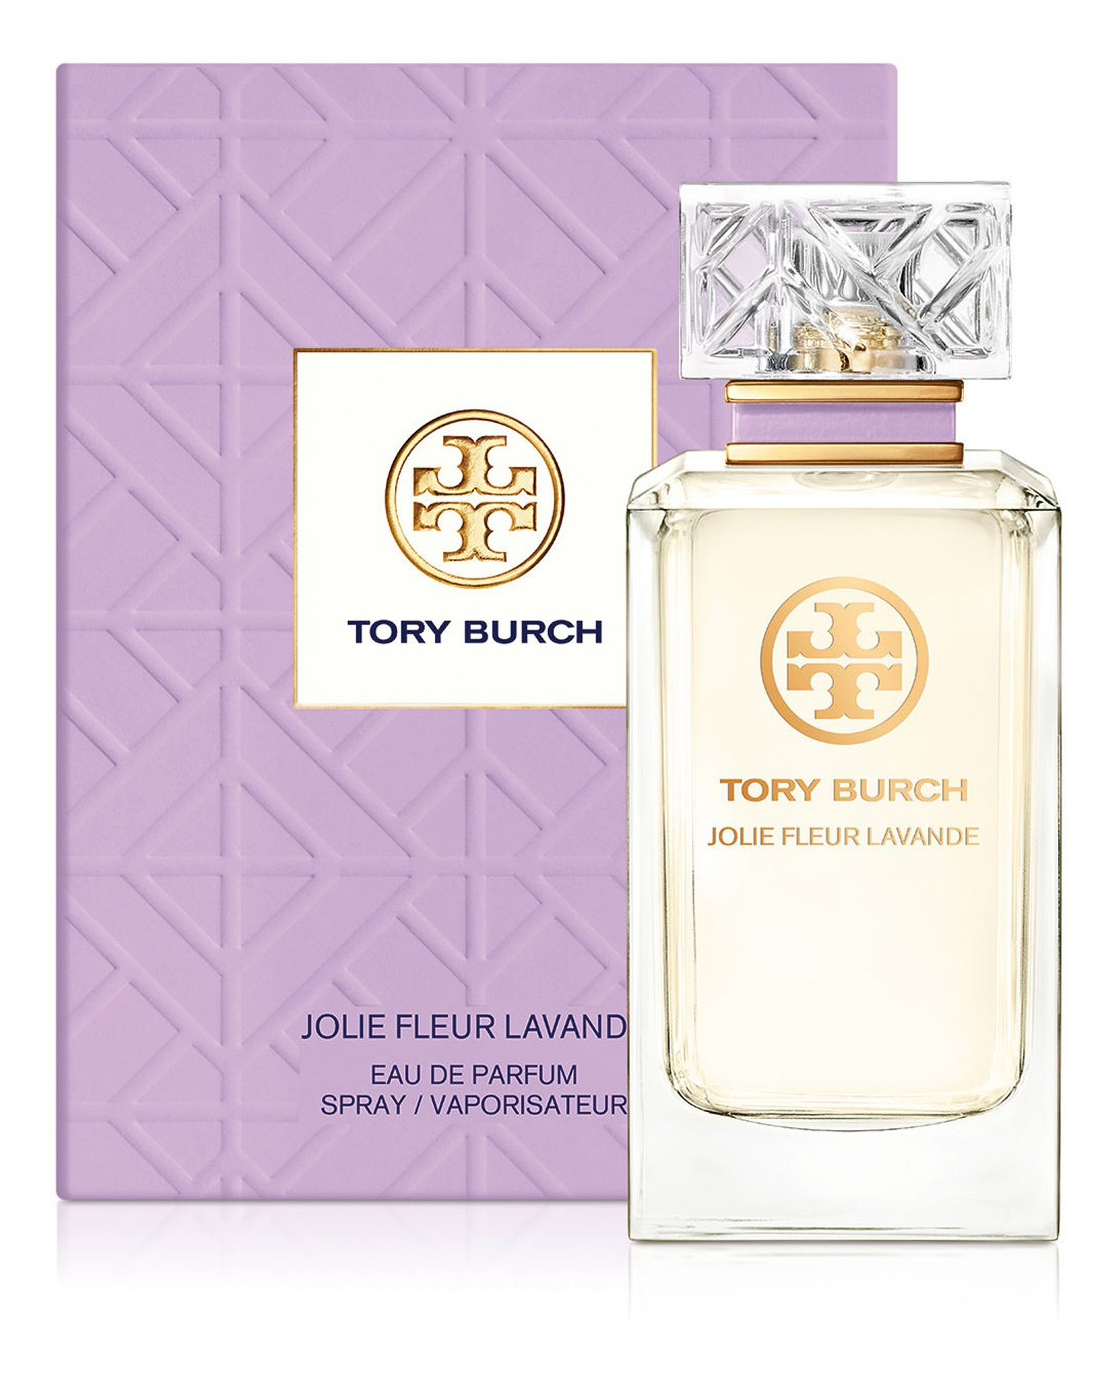 e95e6b5ec4d Jolie Fleur Lavande Tory Burch perfume - a new fragrance for women 2017